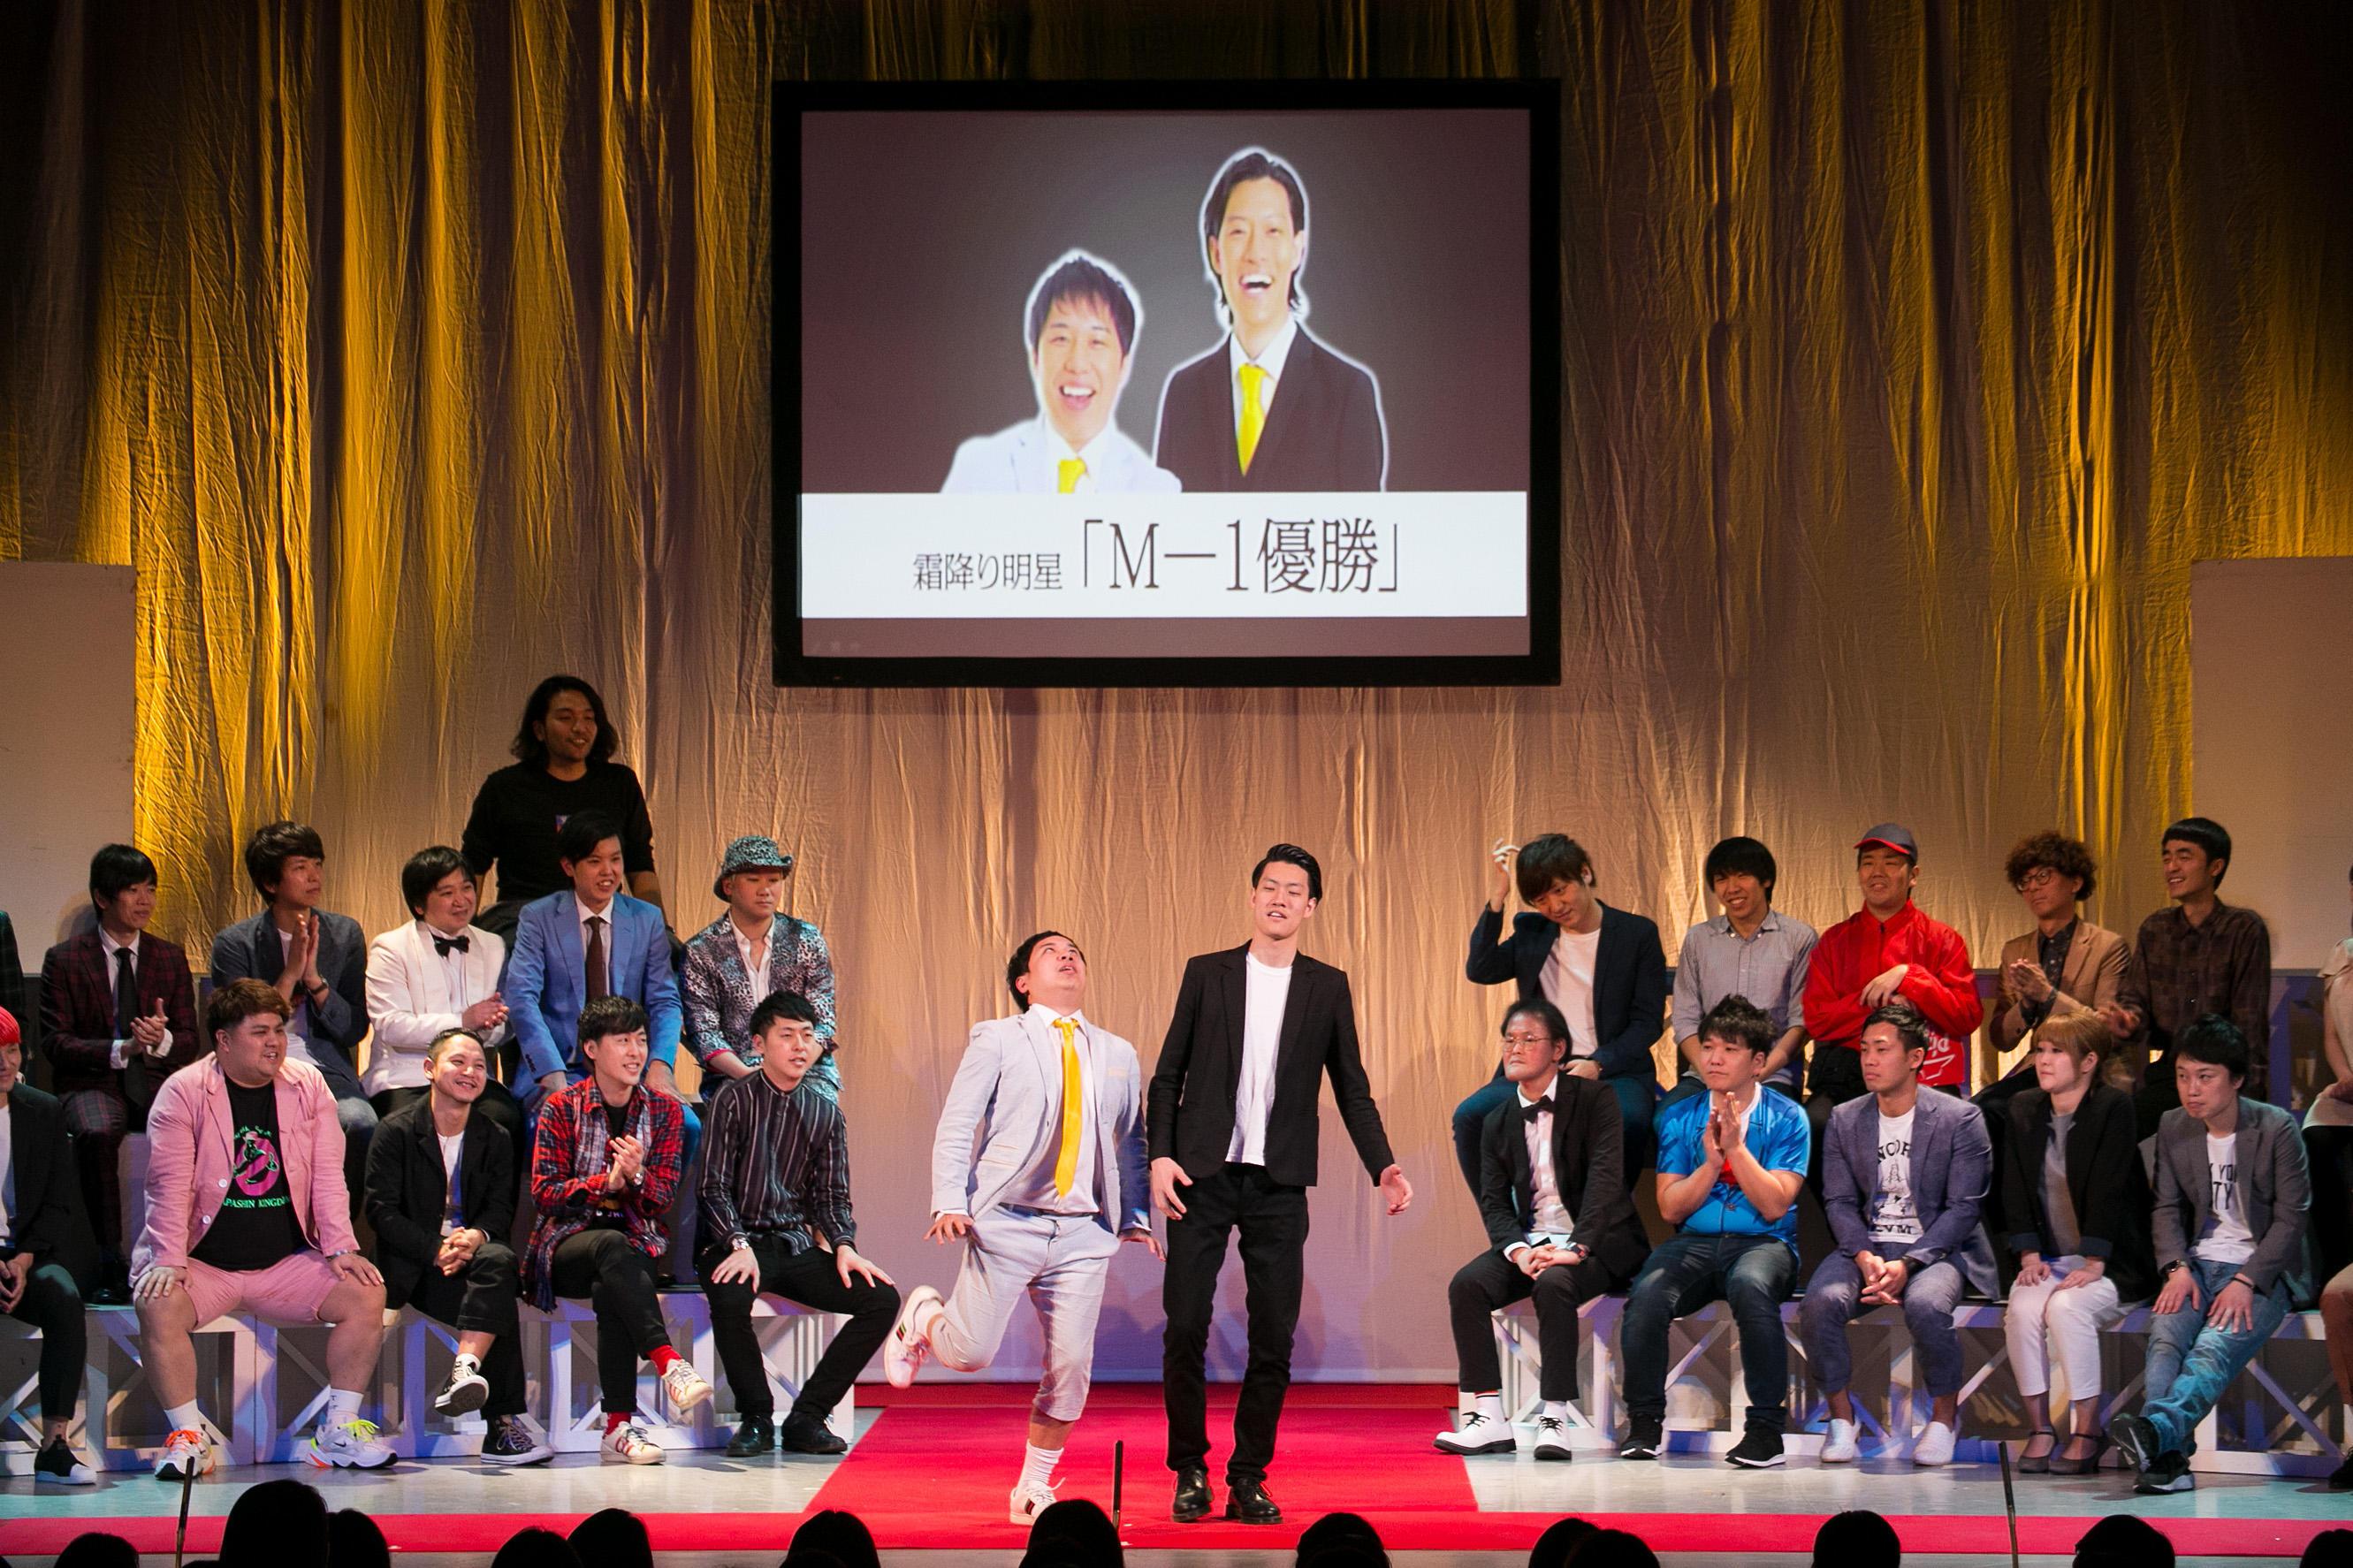 http://news.yoshimoto.co.jp/20181228112203-796a2979564baefc7e6533591603933aae38b7ab.jpg